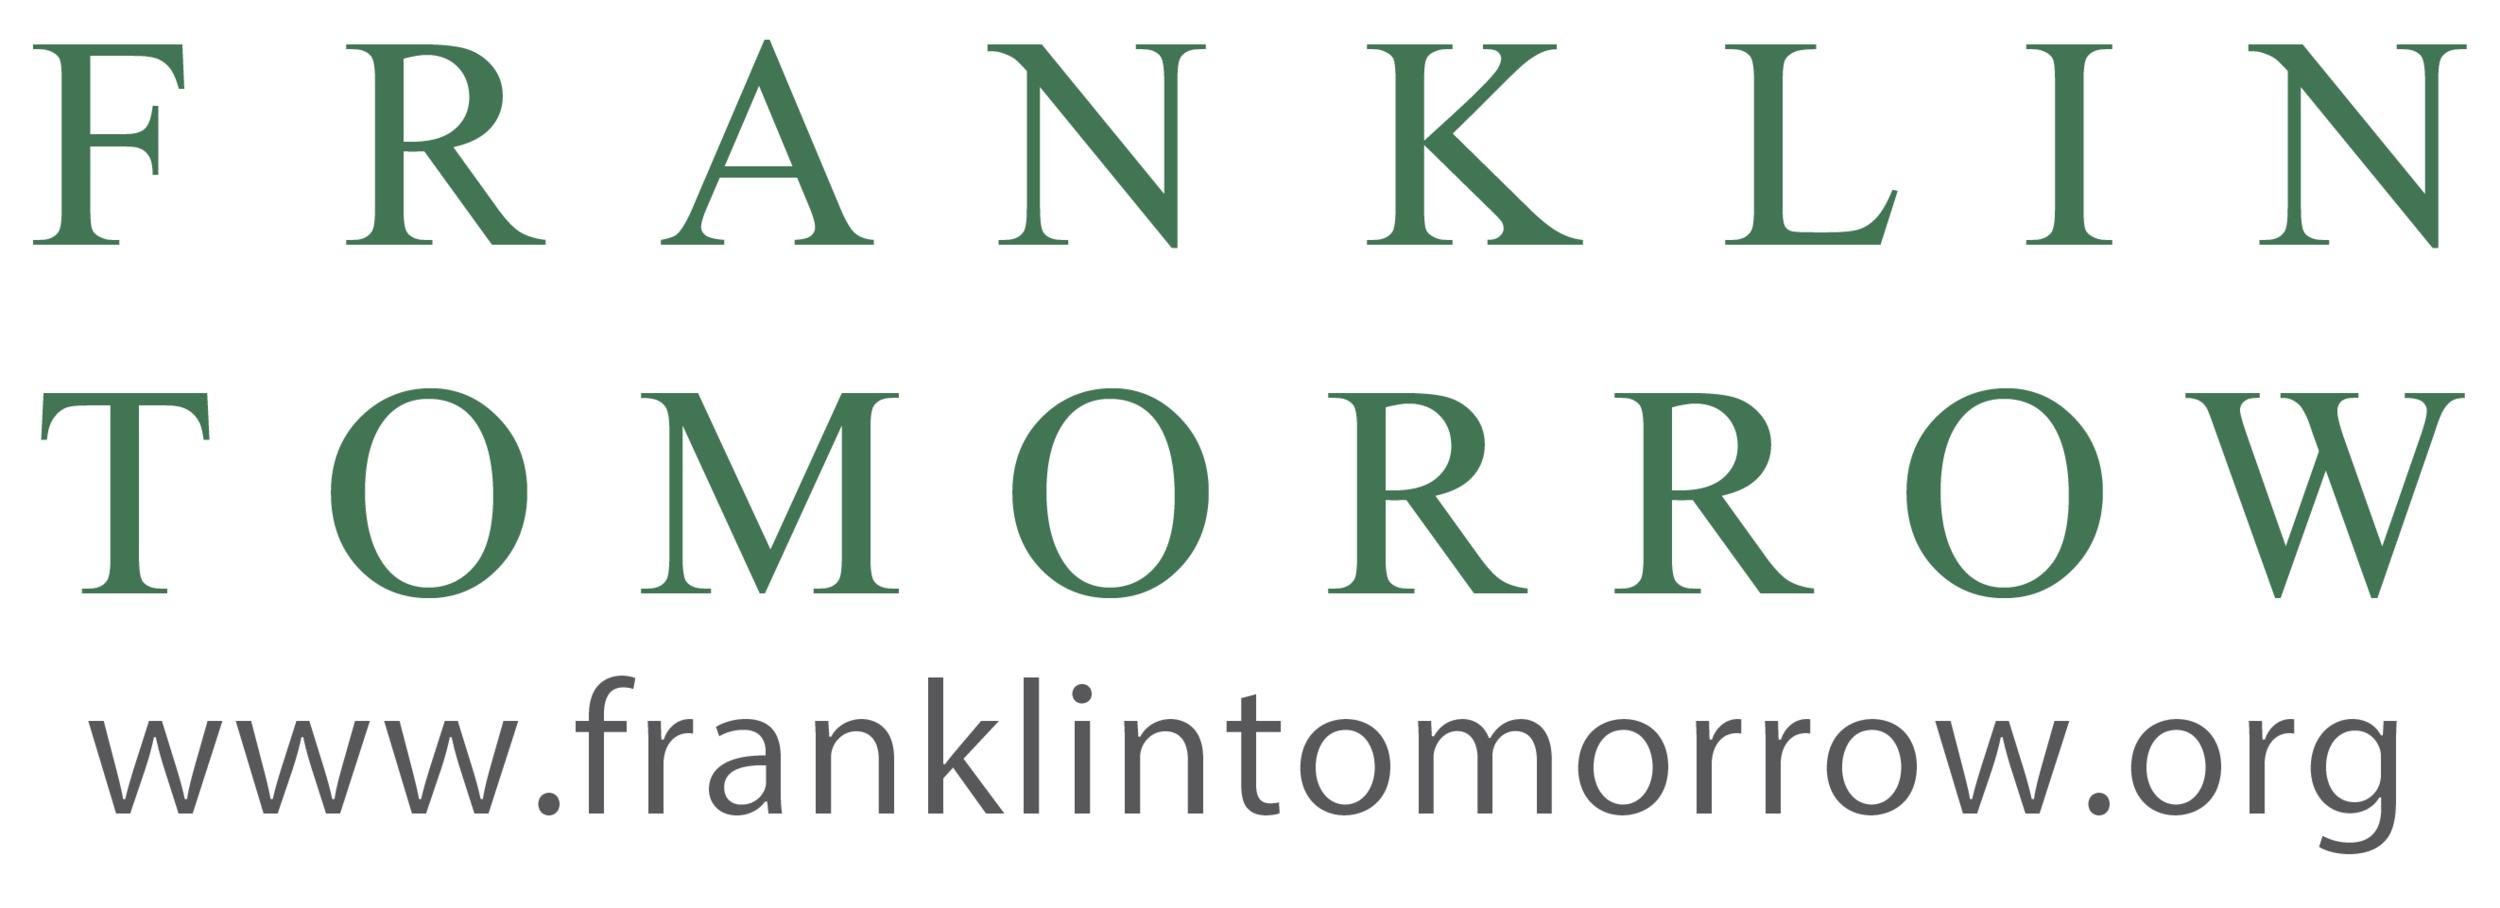 franklin tomorrow logo website green.png